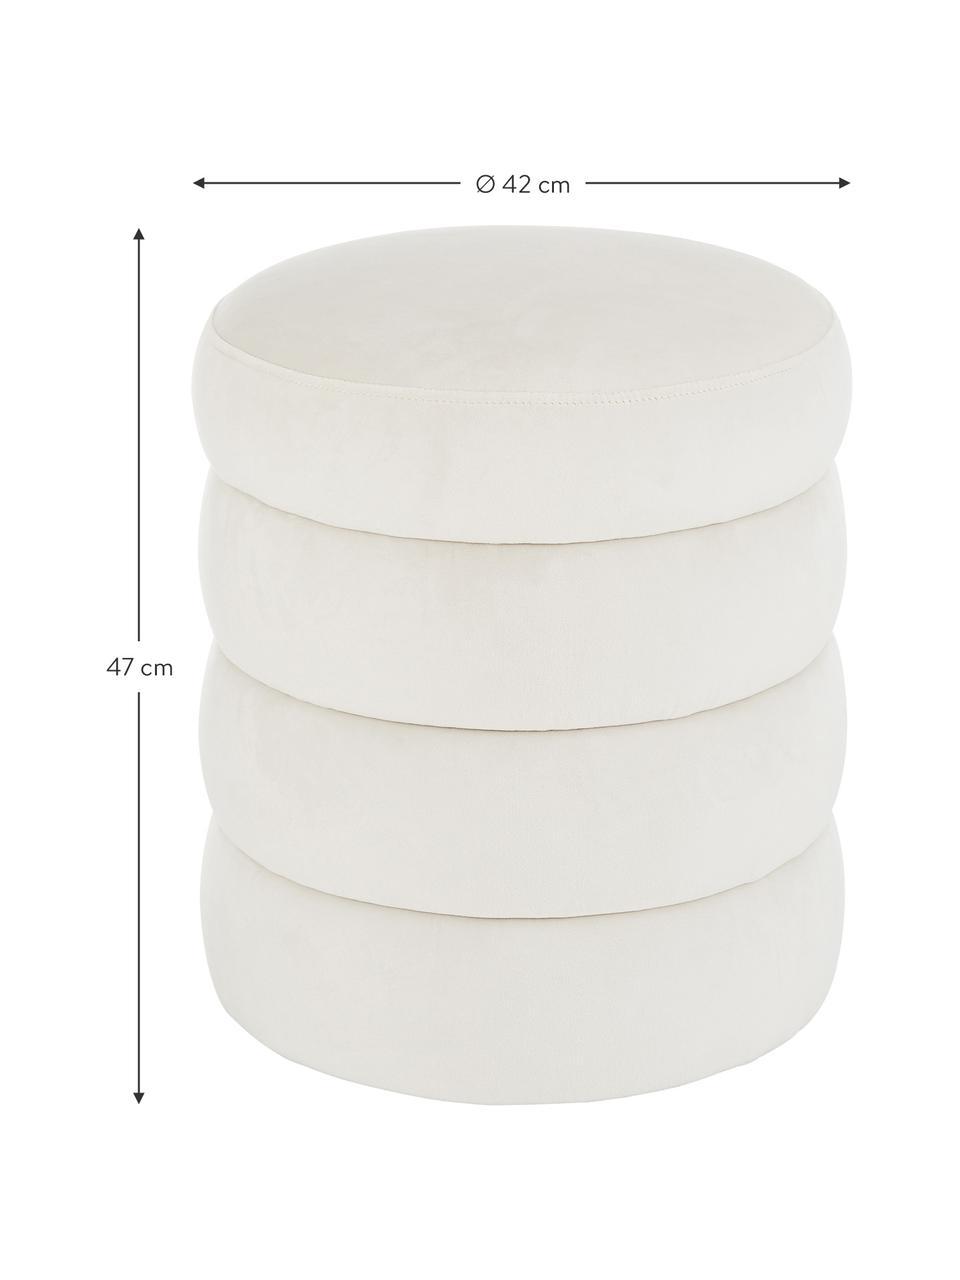 Puf de terciopelo Alto, Tapizado: terciopelo (poliéster) Al, Estructura: madera de pino maciza, ma, Blanco crema, Ø 42 x Al 47 cm